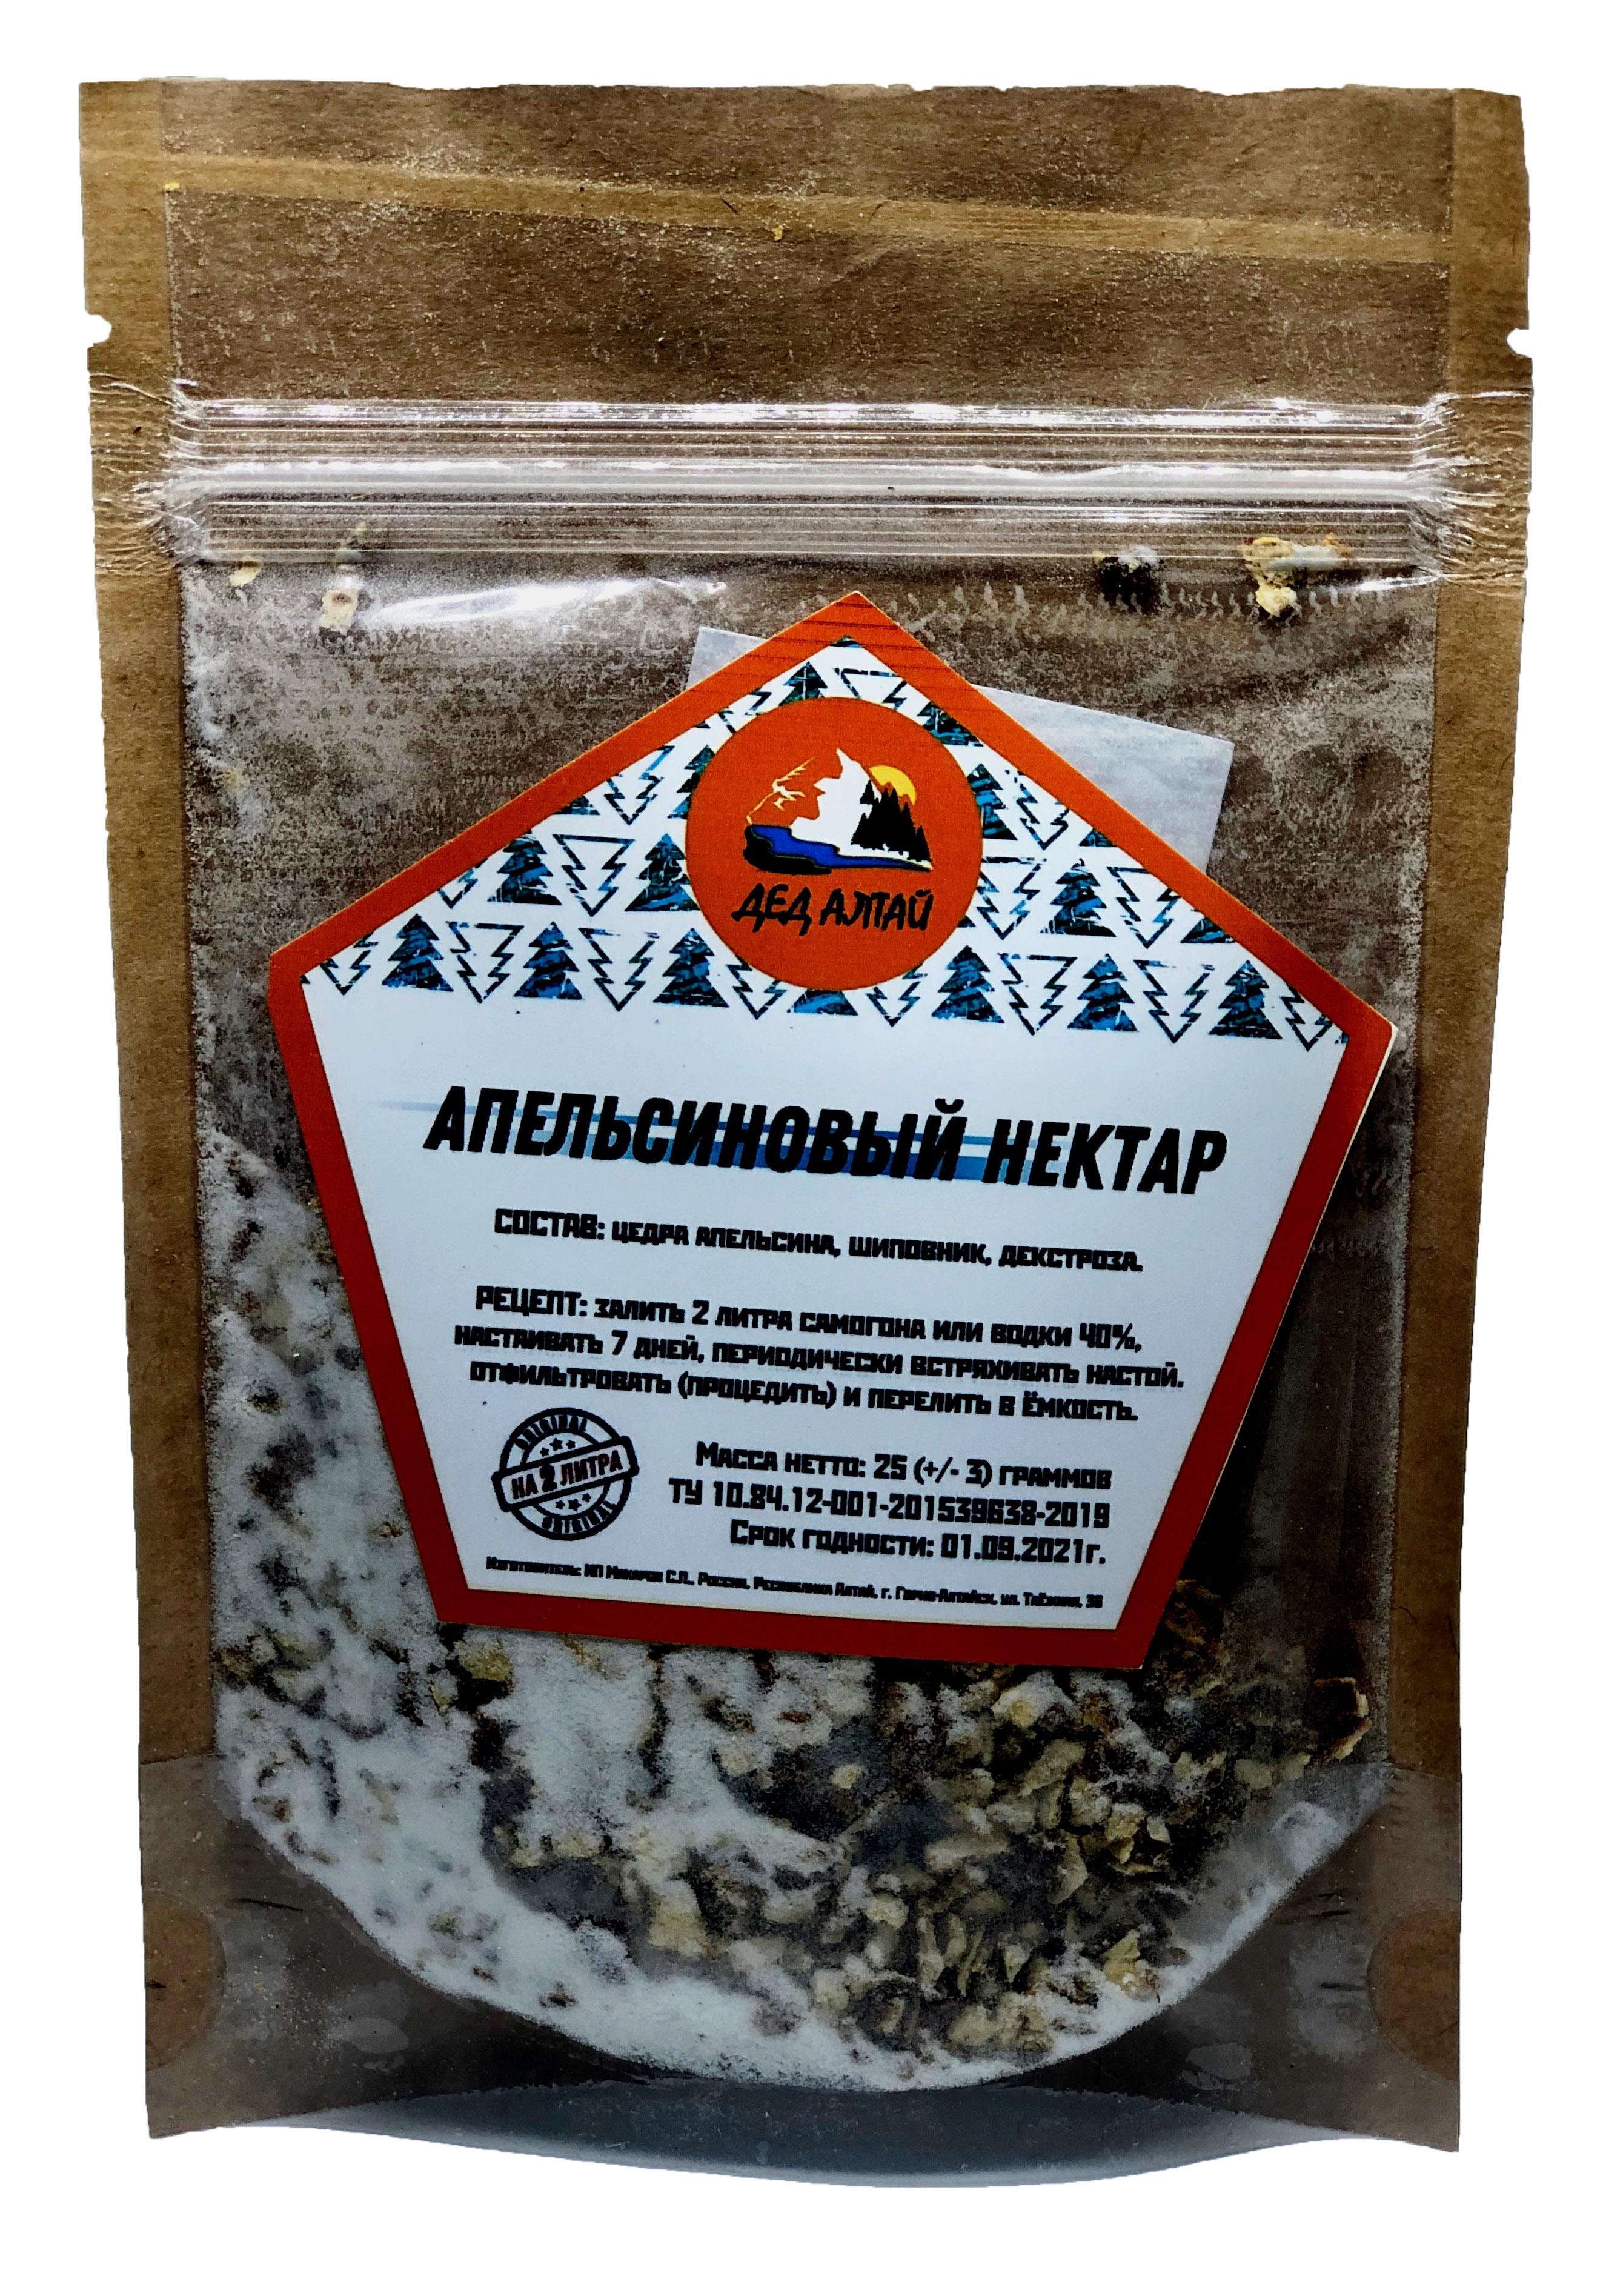 Tincture Of Herbs And Spices Santa Алтай Orange Nectar Tincture апельсиновая Brew Distillate Home Alcohol